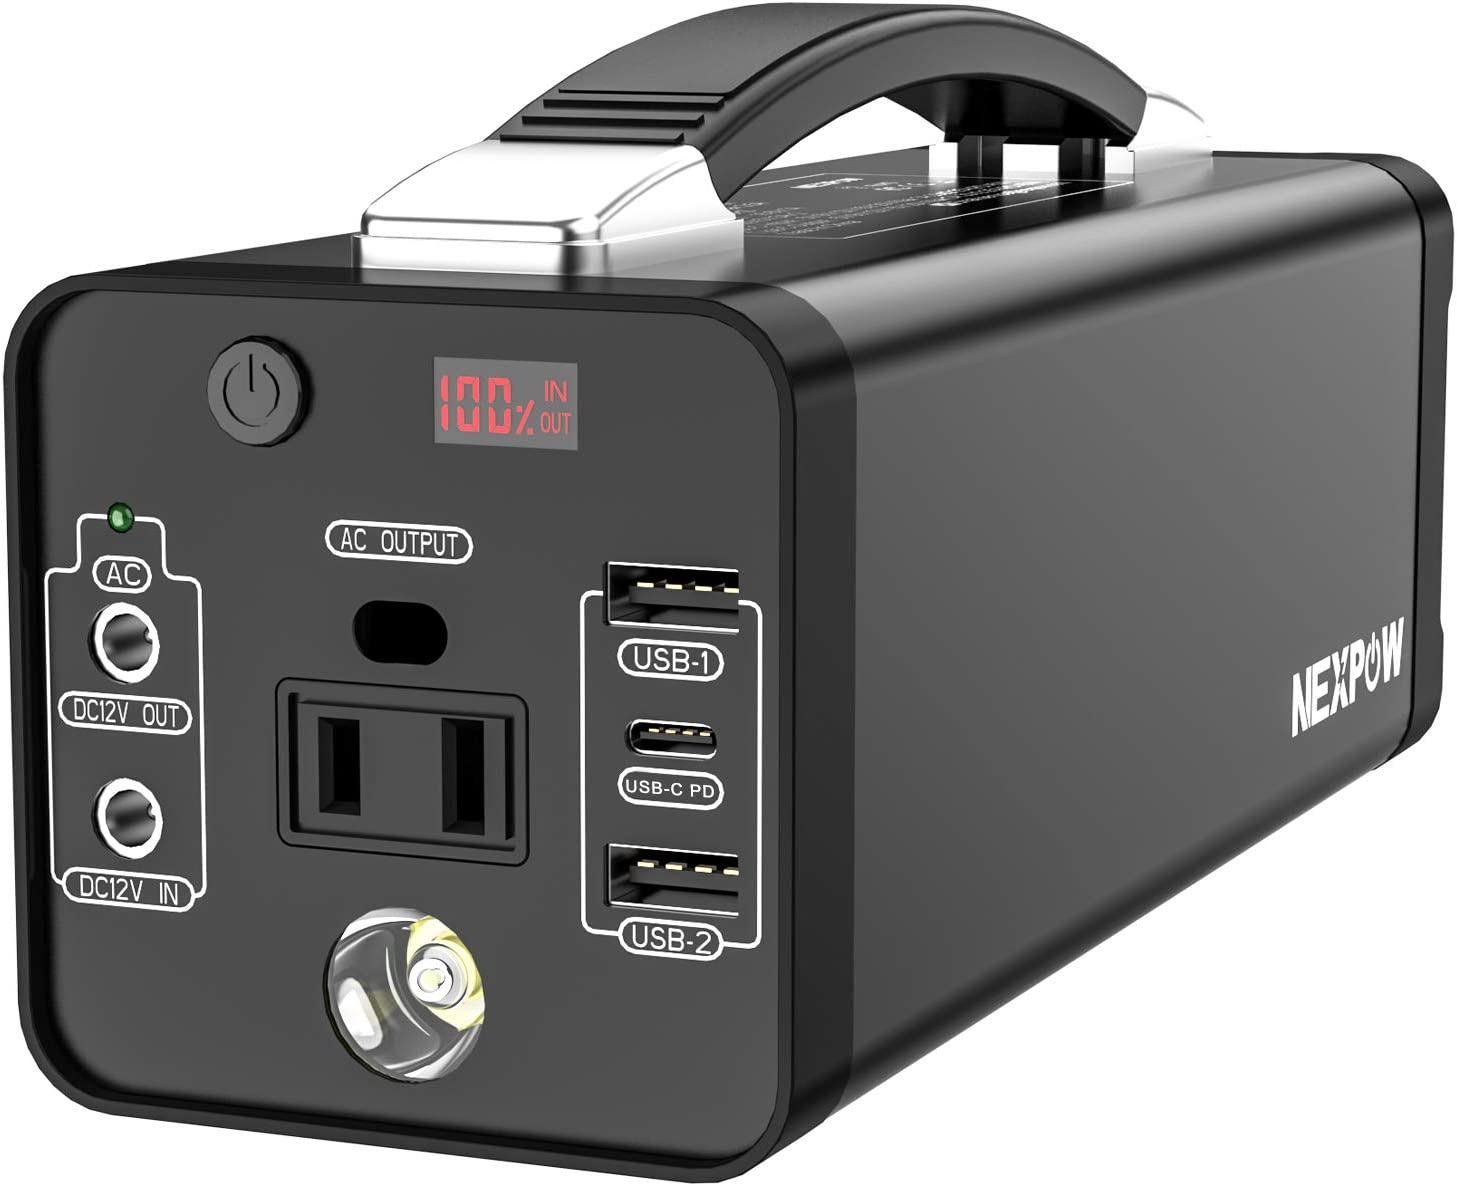 Nexpow  178Wh 48000mAh Lithium 110V/120W Portable Power Station $90.19 Coupon